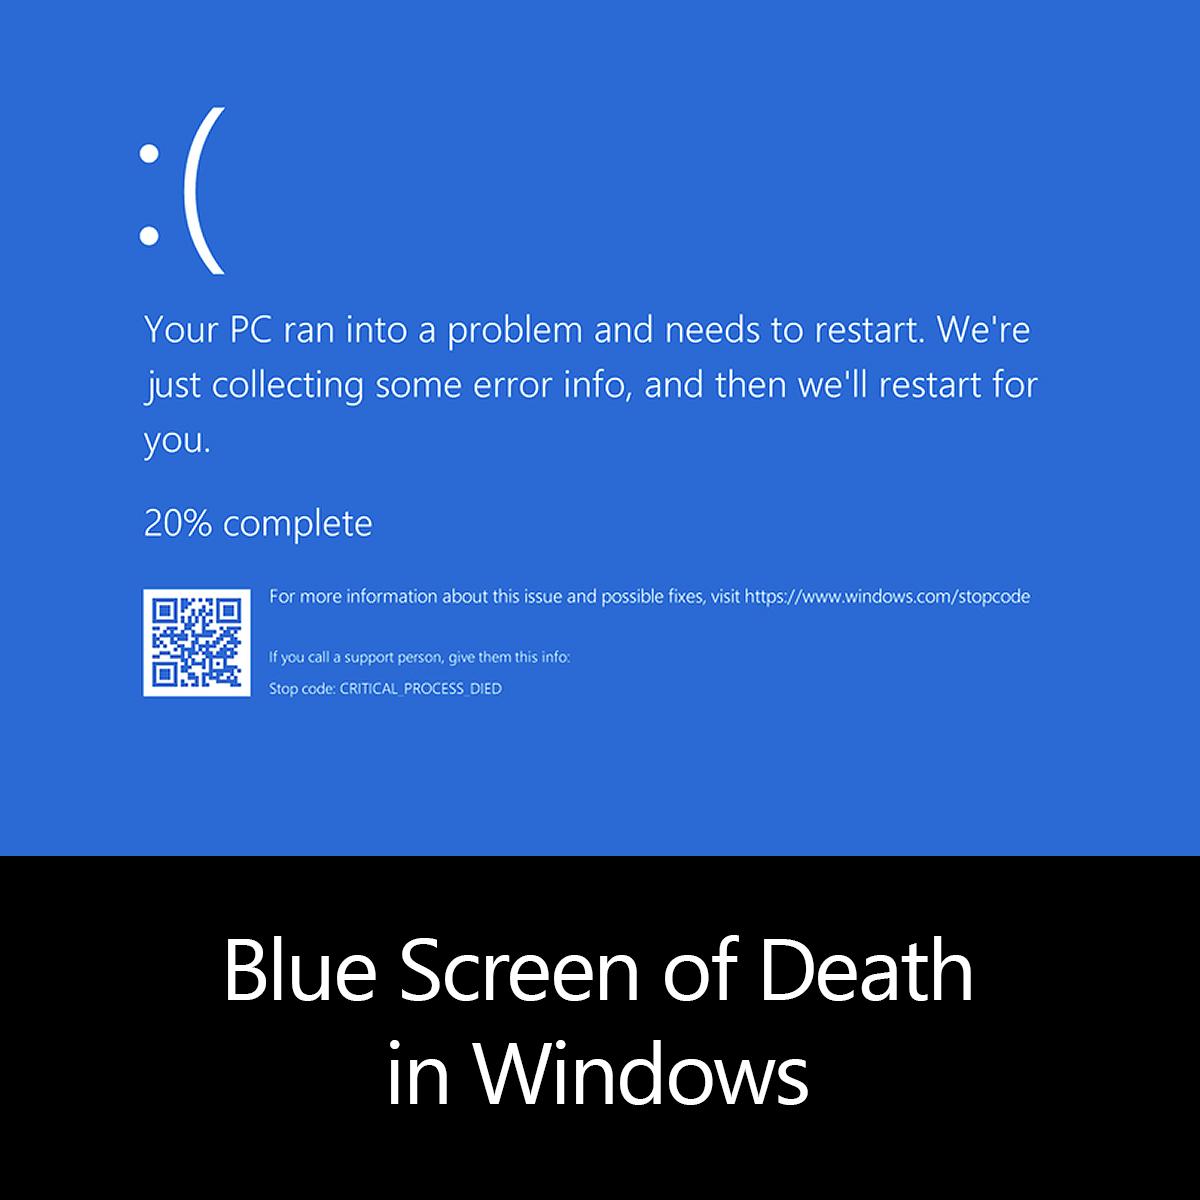 Blue Screen of Death in Windows